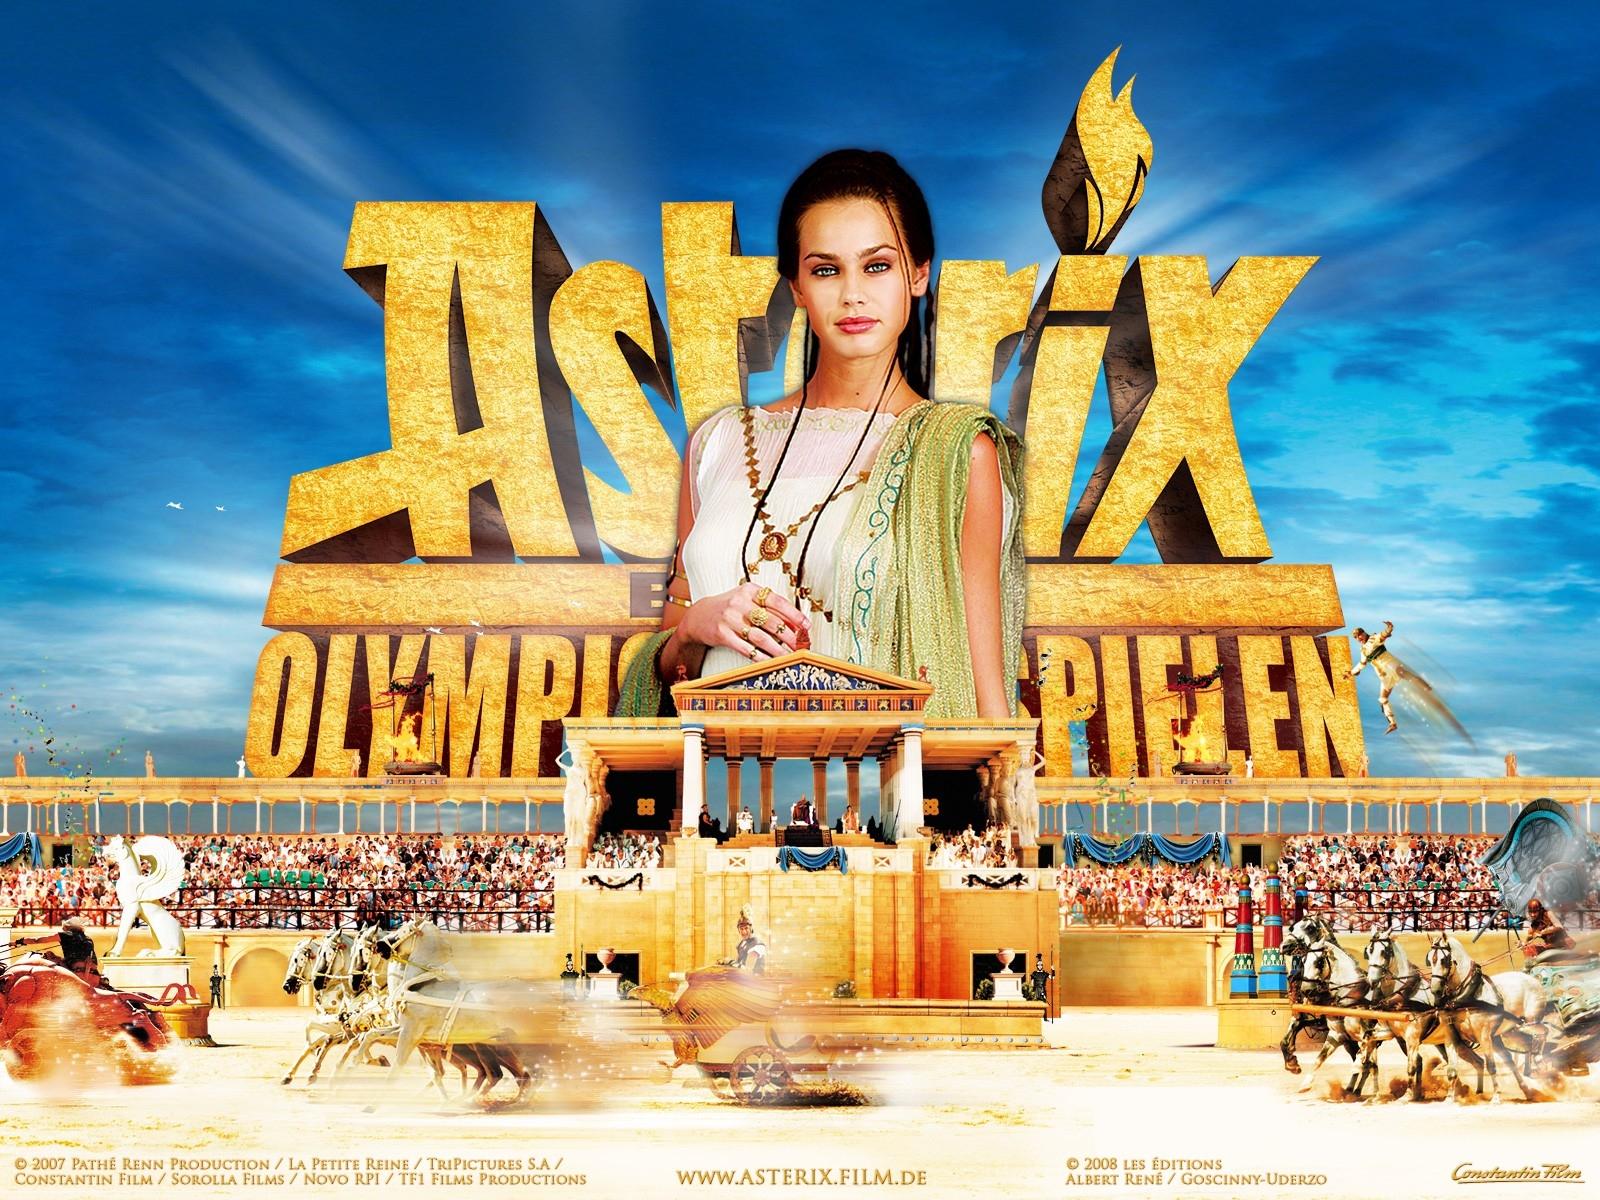 Wallpaper del film Asterix alle Olimpiadi con la bella Vanessa Hessler